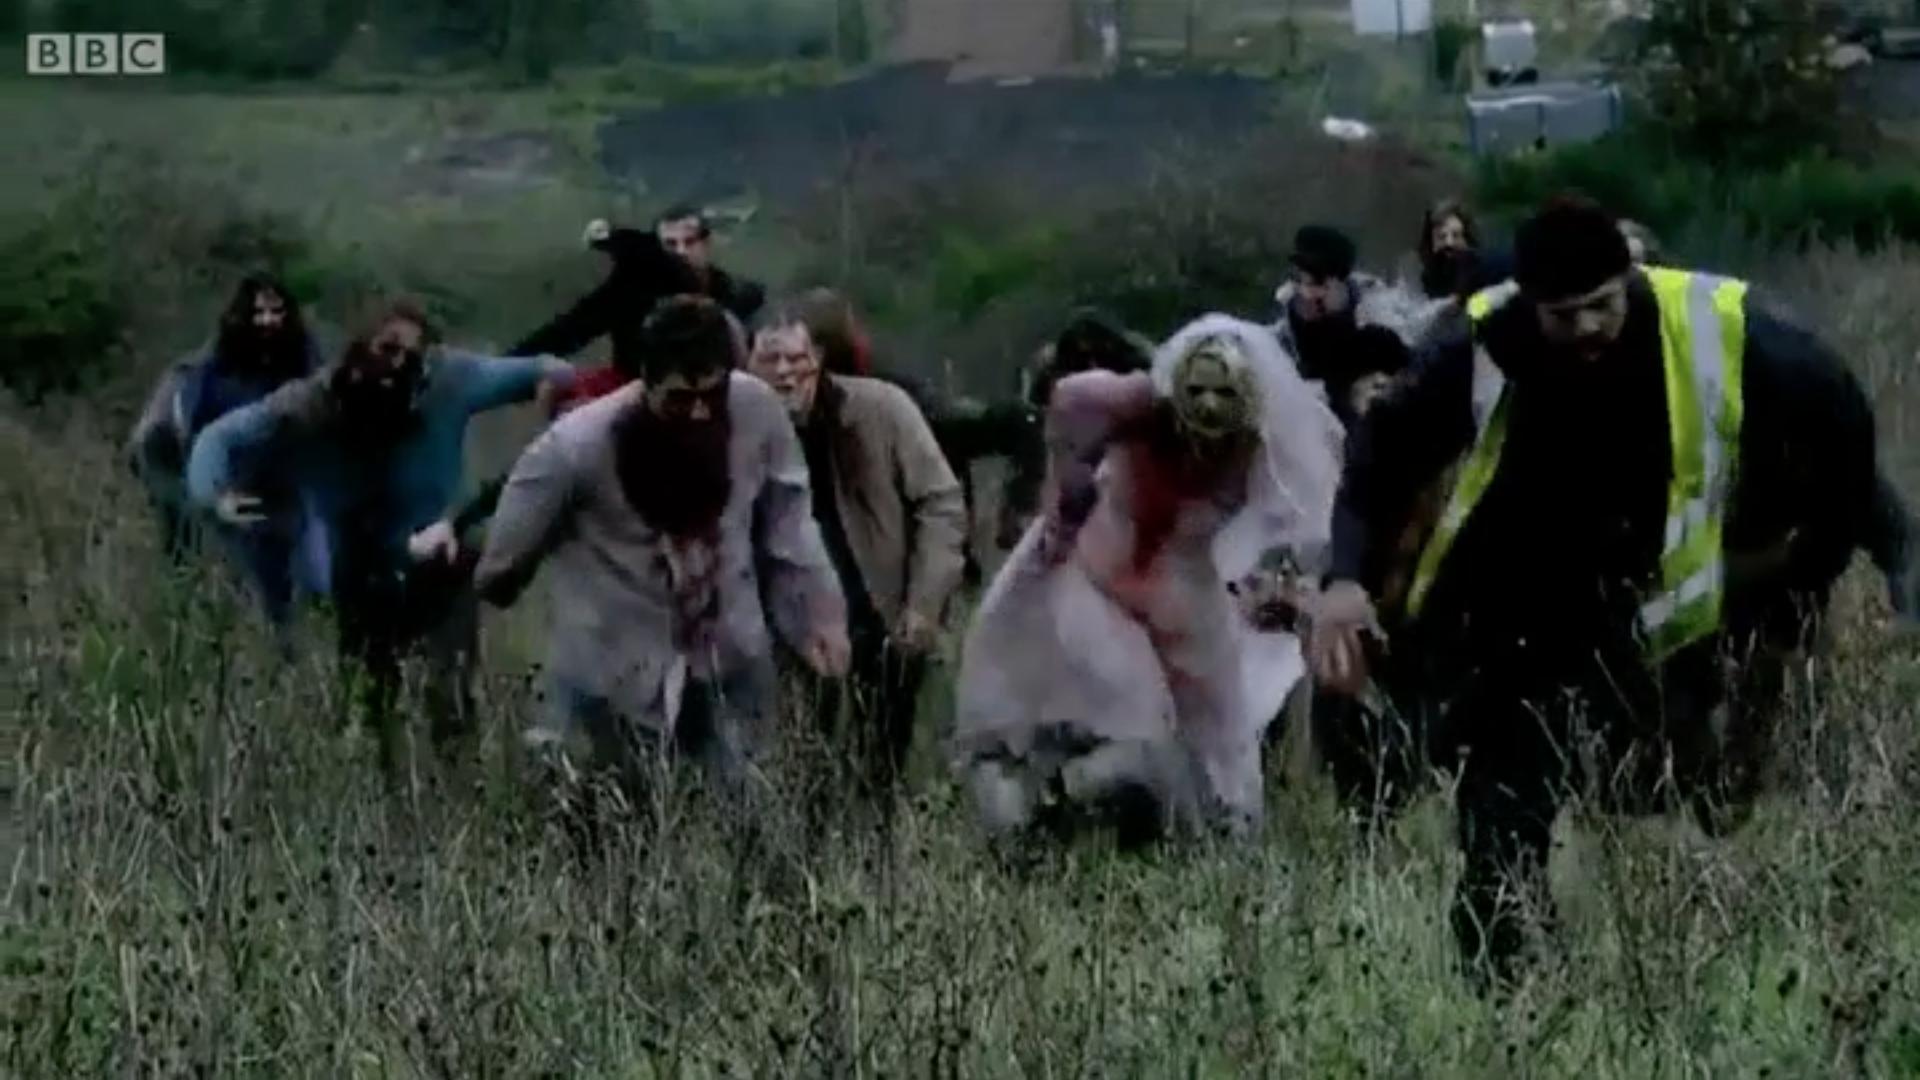 Zombies (I Survived a Zombie Apocalypse)